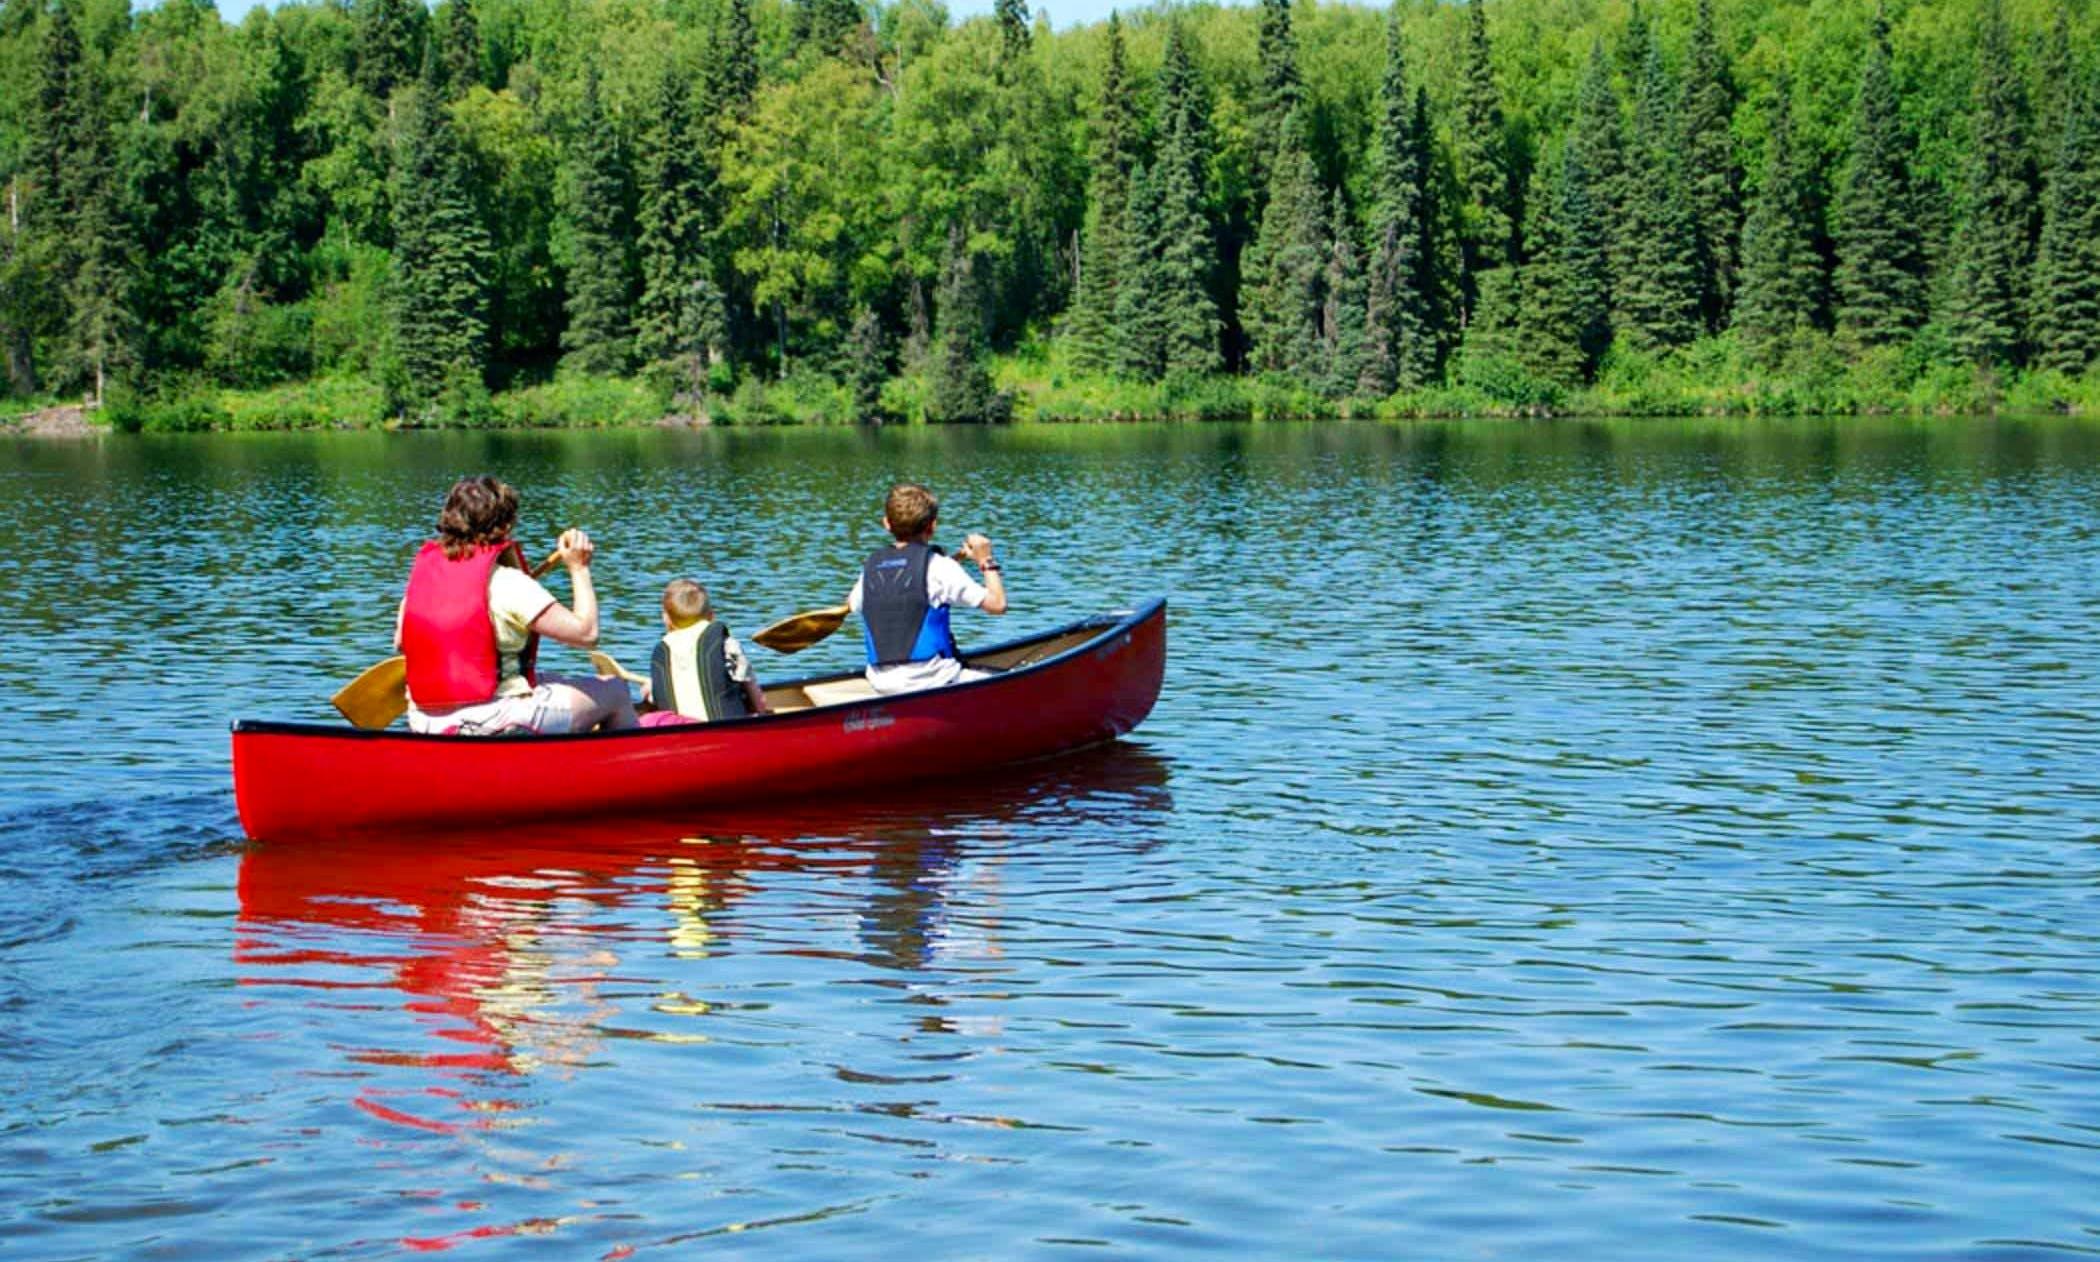 Canoe Rental in Eureka